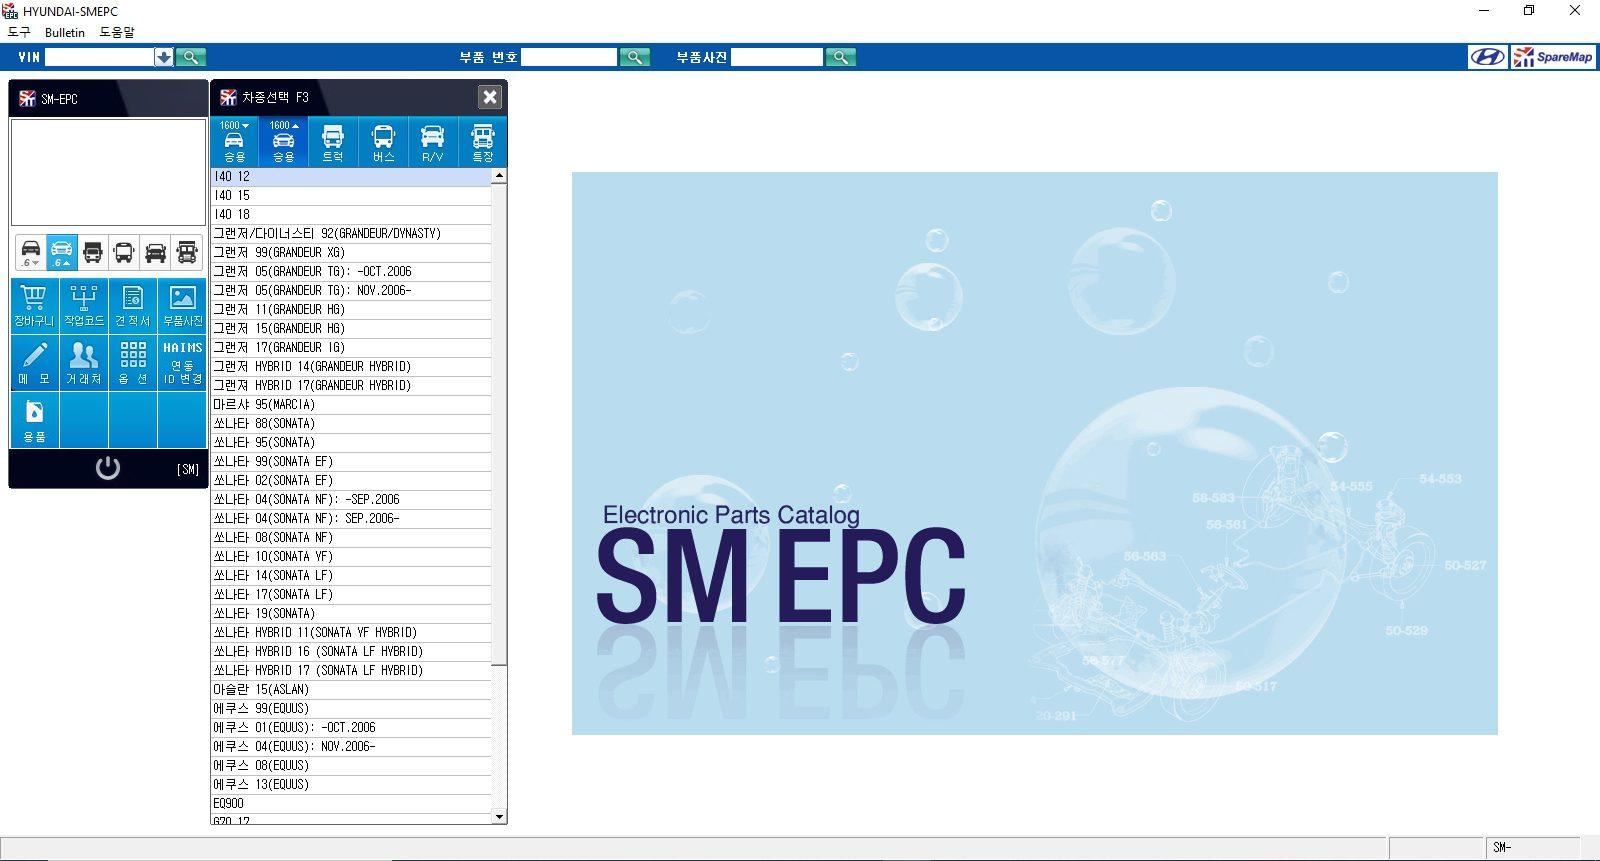 Hyundai_Kia_Korea_SM_EPC_072019_Parts_Catalog_Domestic_Market_11